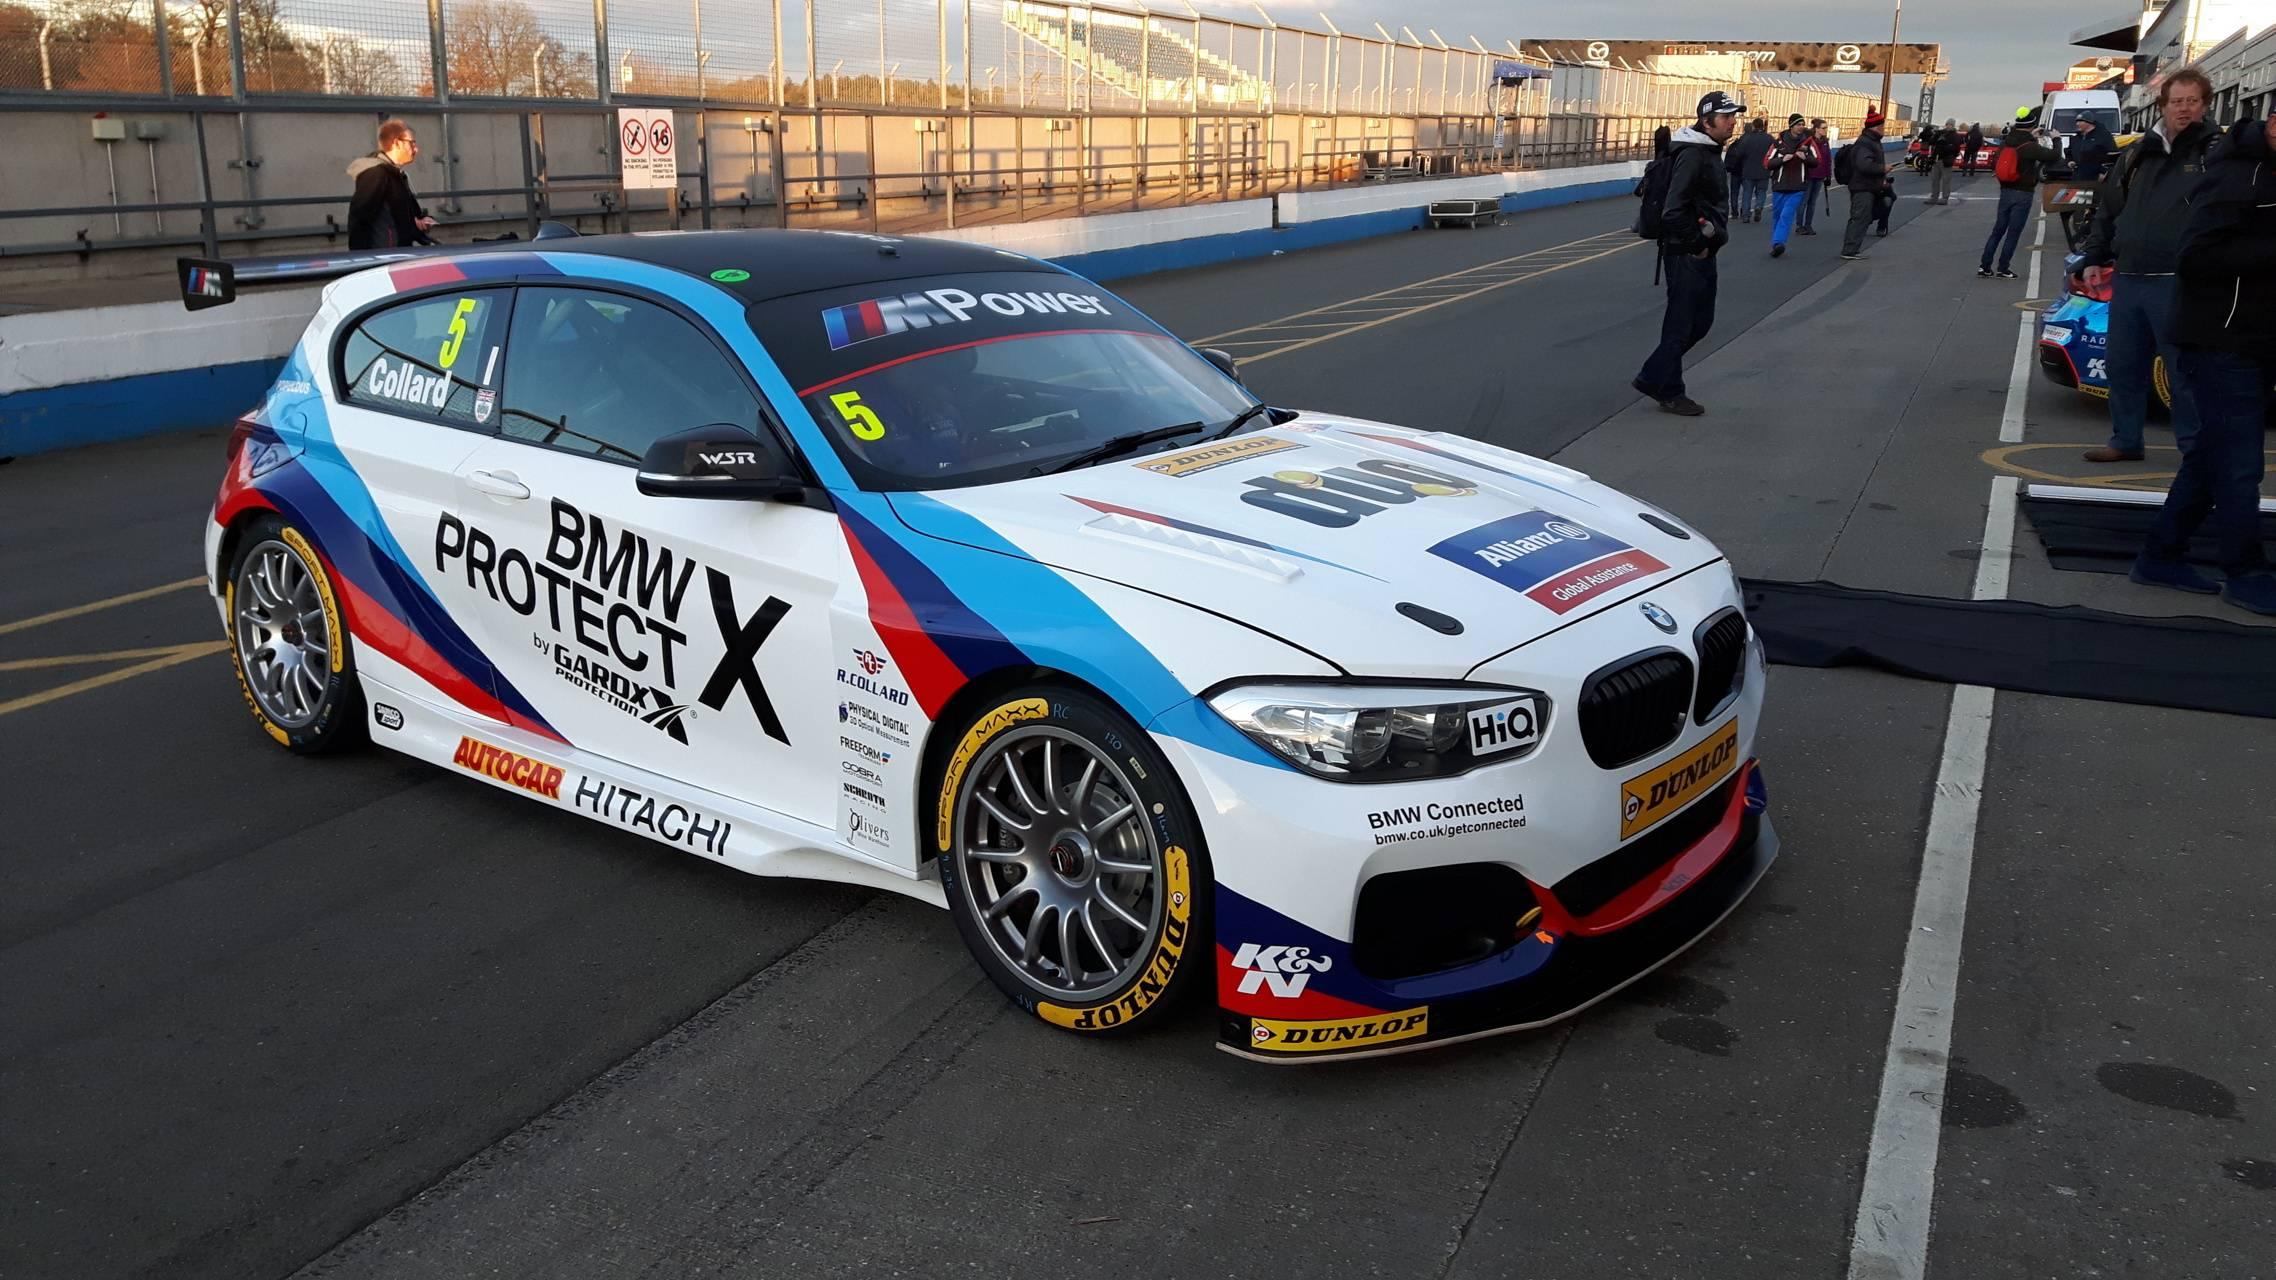 BMW 1 series btcc